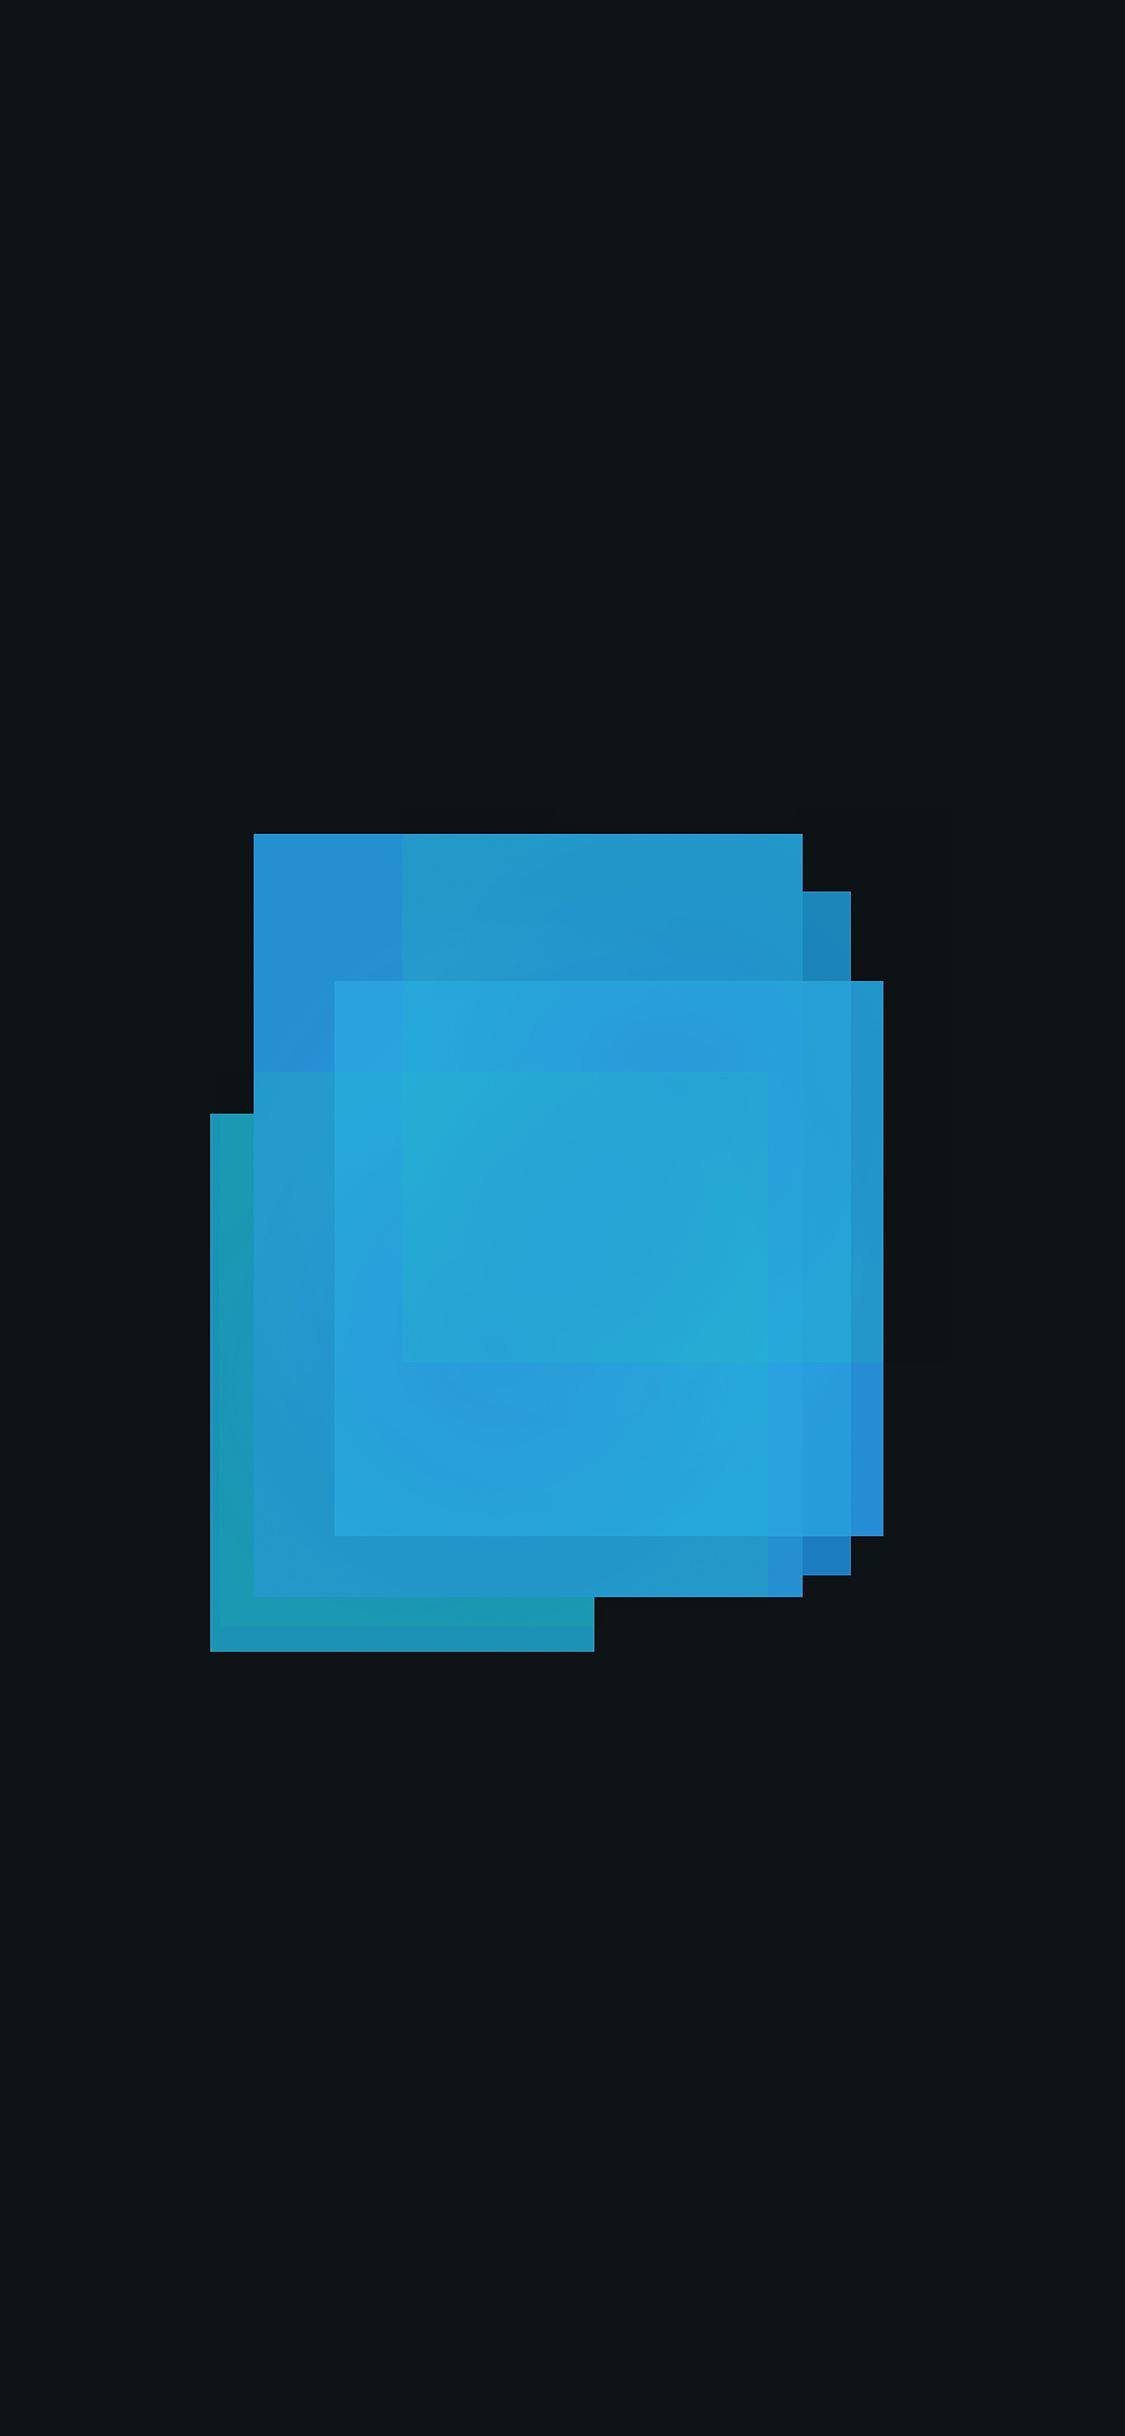 iPhoneXpapers.com-Apple-iPhone-wallpaper-ao42-poster-blue-blocks-art-minimal-simple-dark